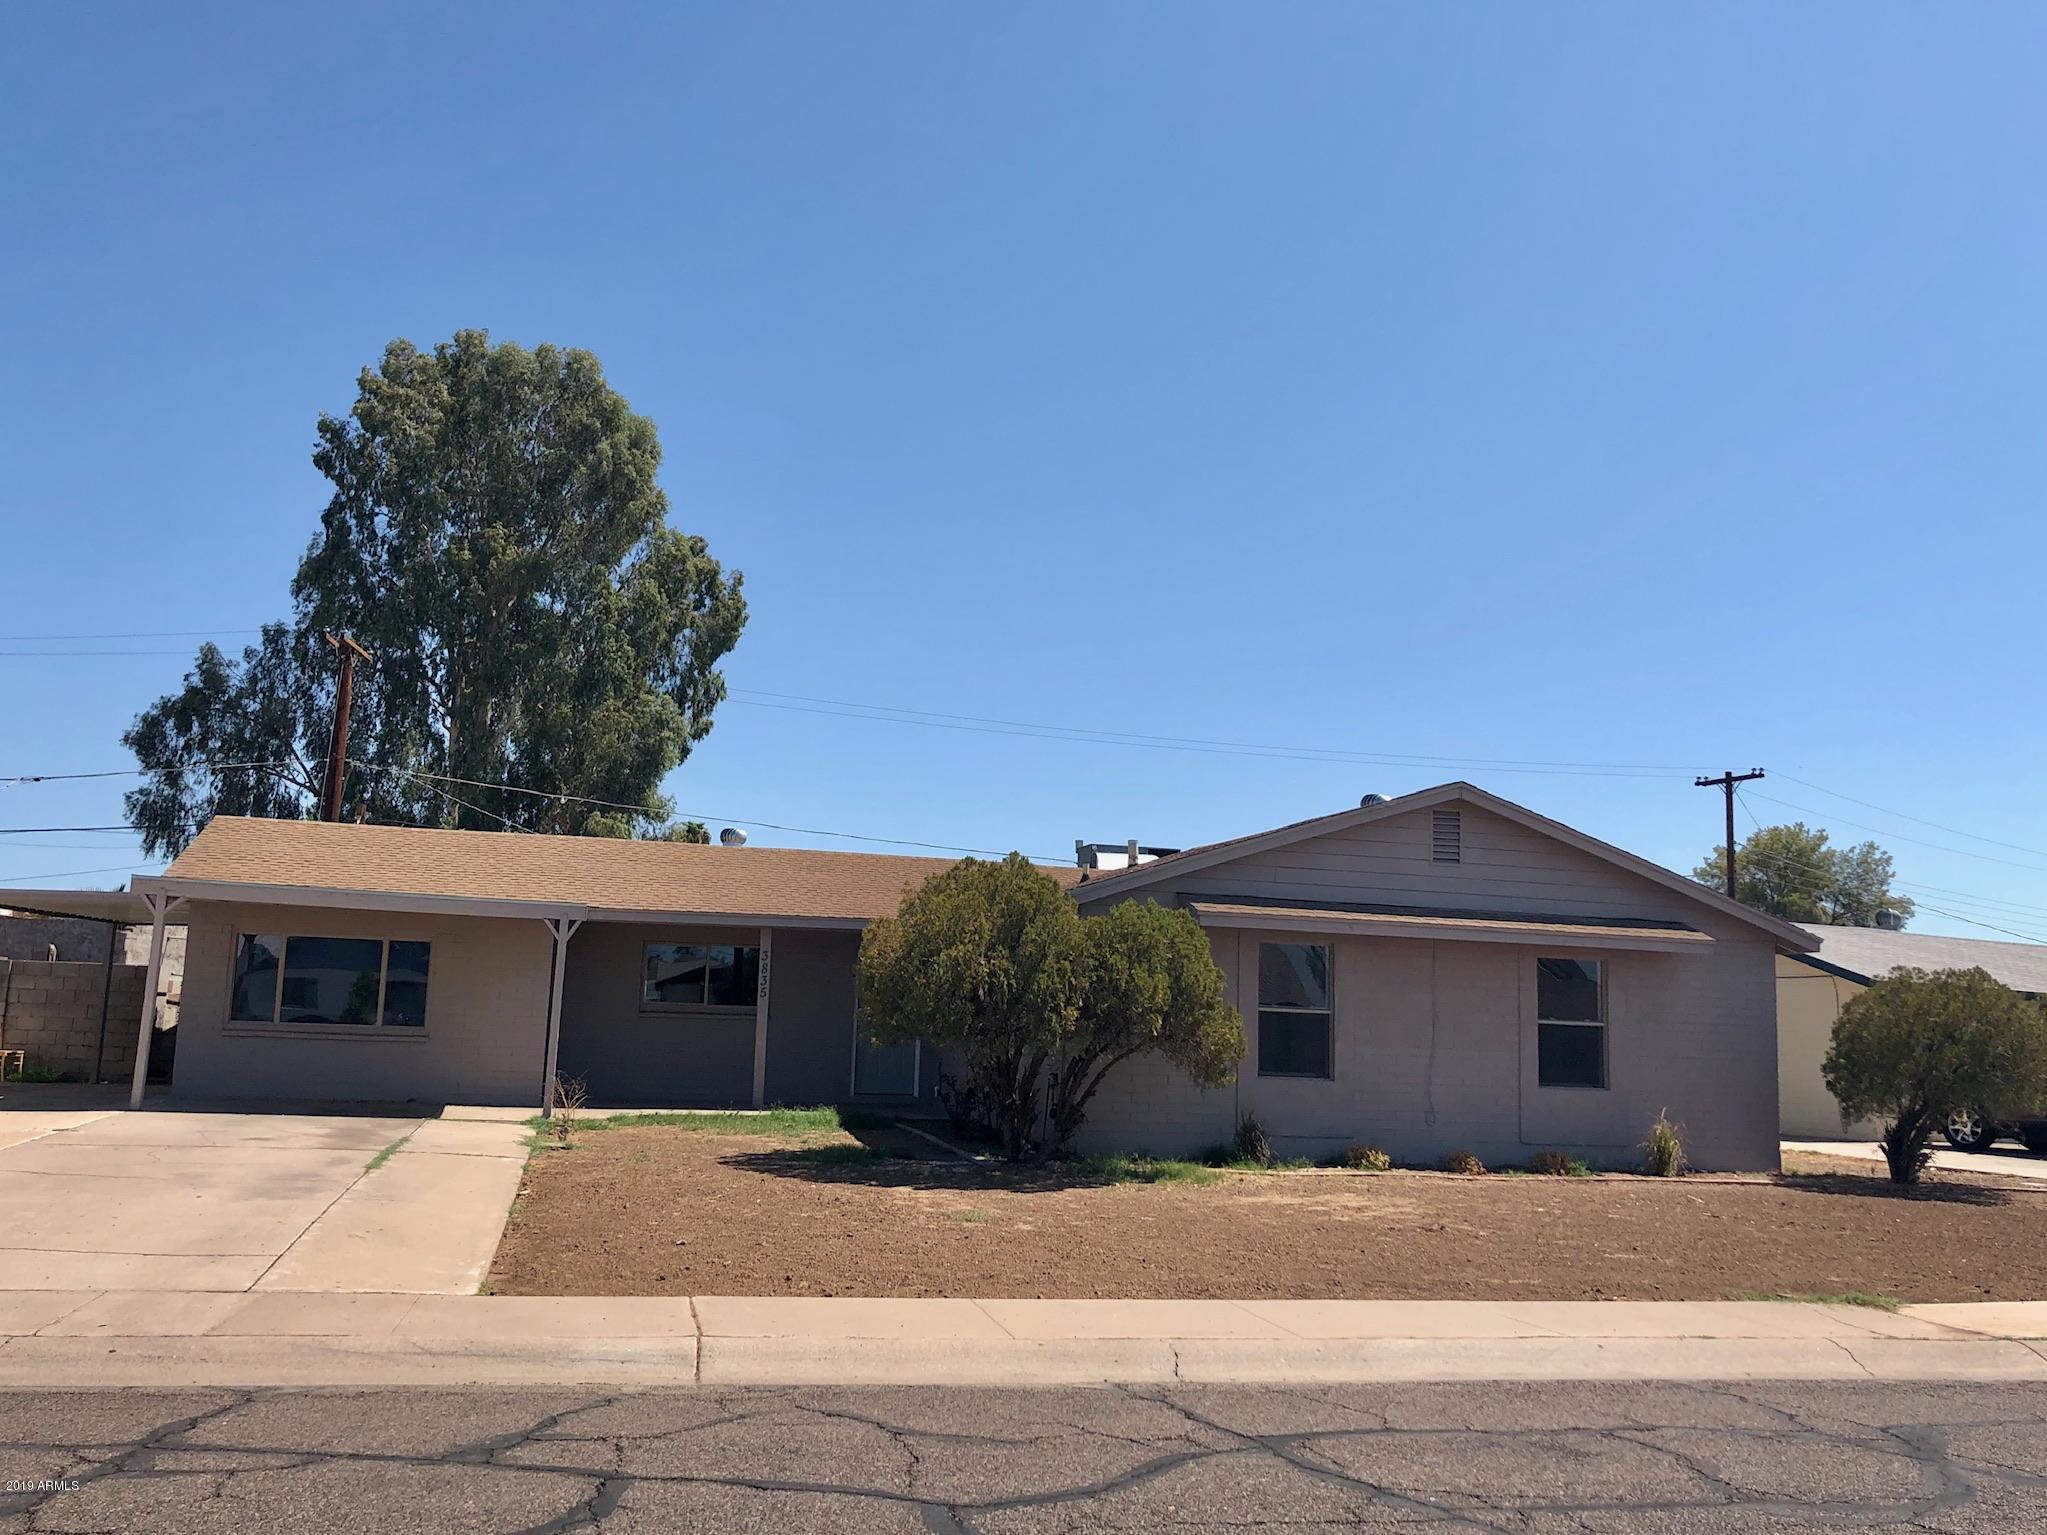 Photo of 3835 N 56TH Avenue, Phoenix, AZ 85031